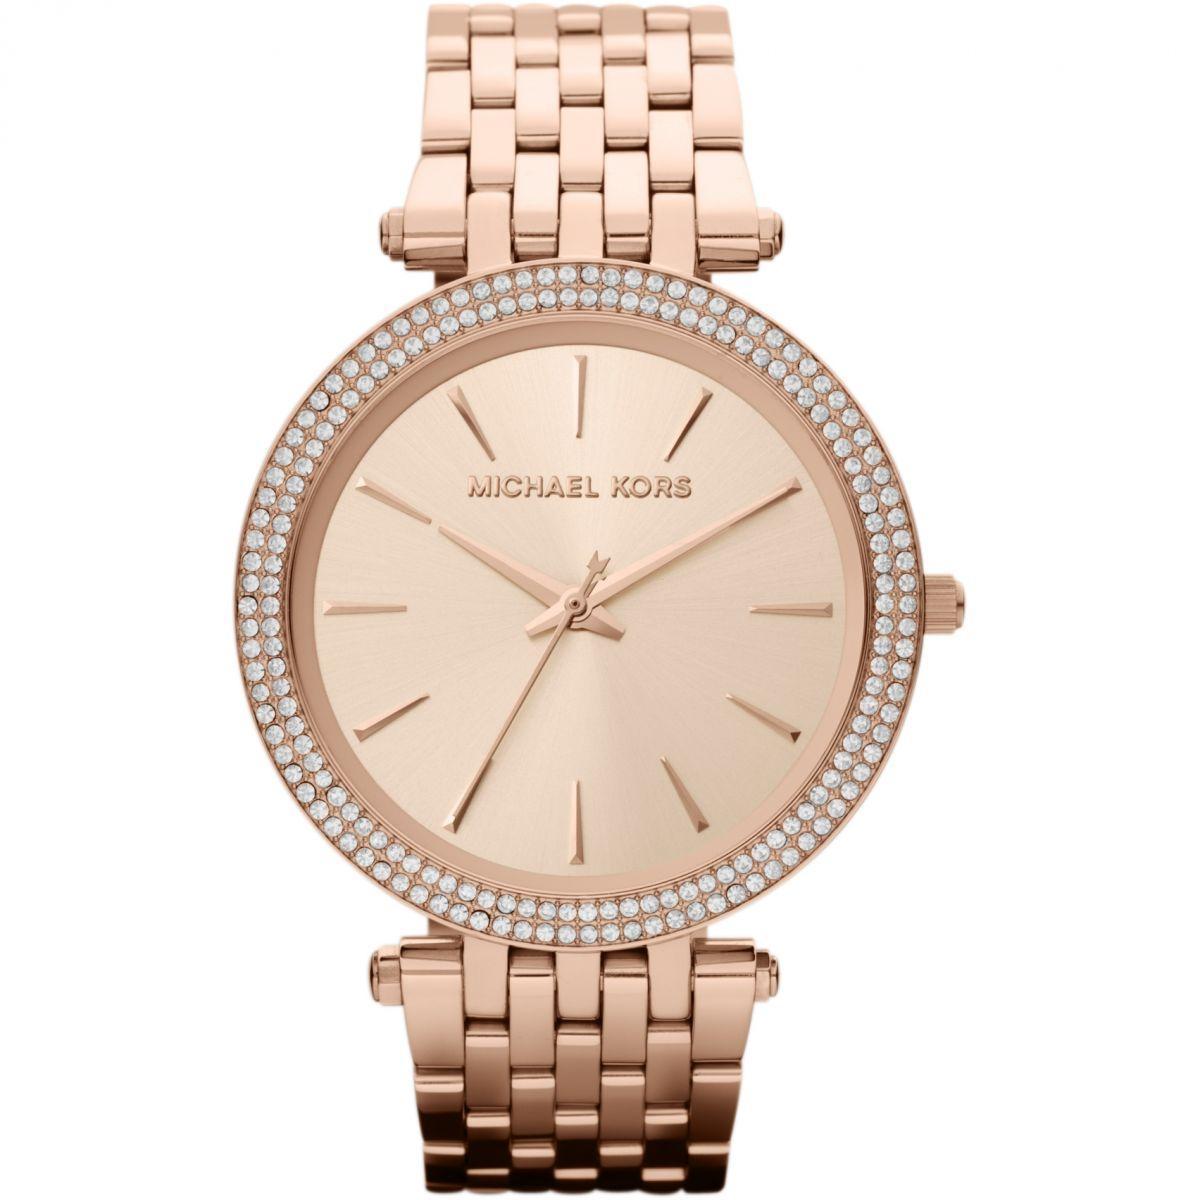 99927eccf6b55 Michael Kors Darci Glitz Rose Gold Dial Pave Bezel Ladies Watch 39mm MK3192